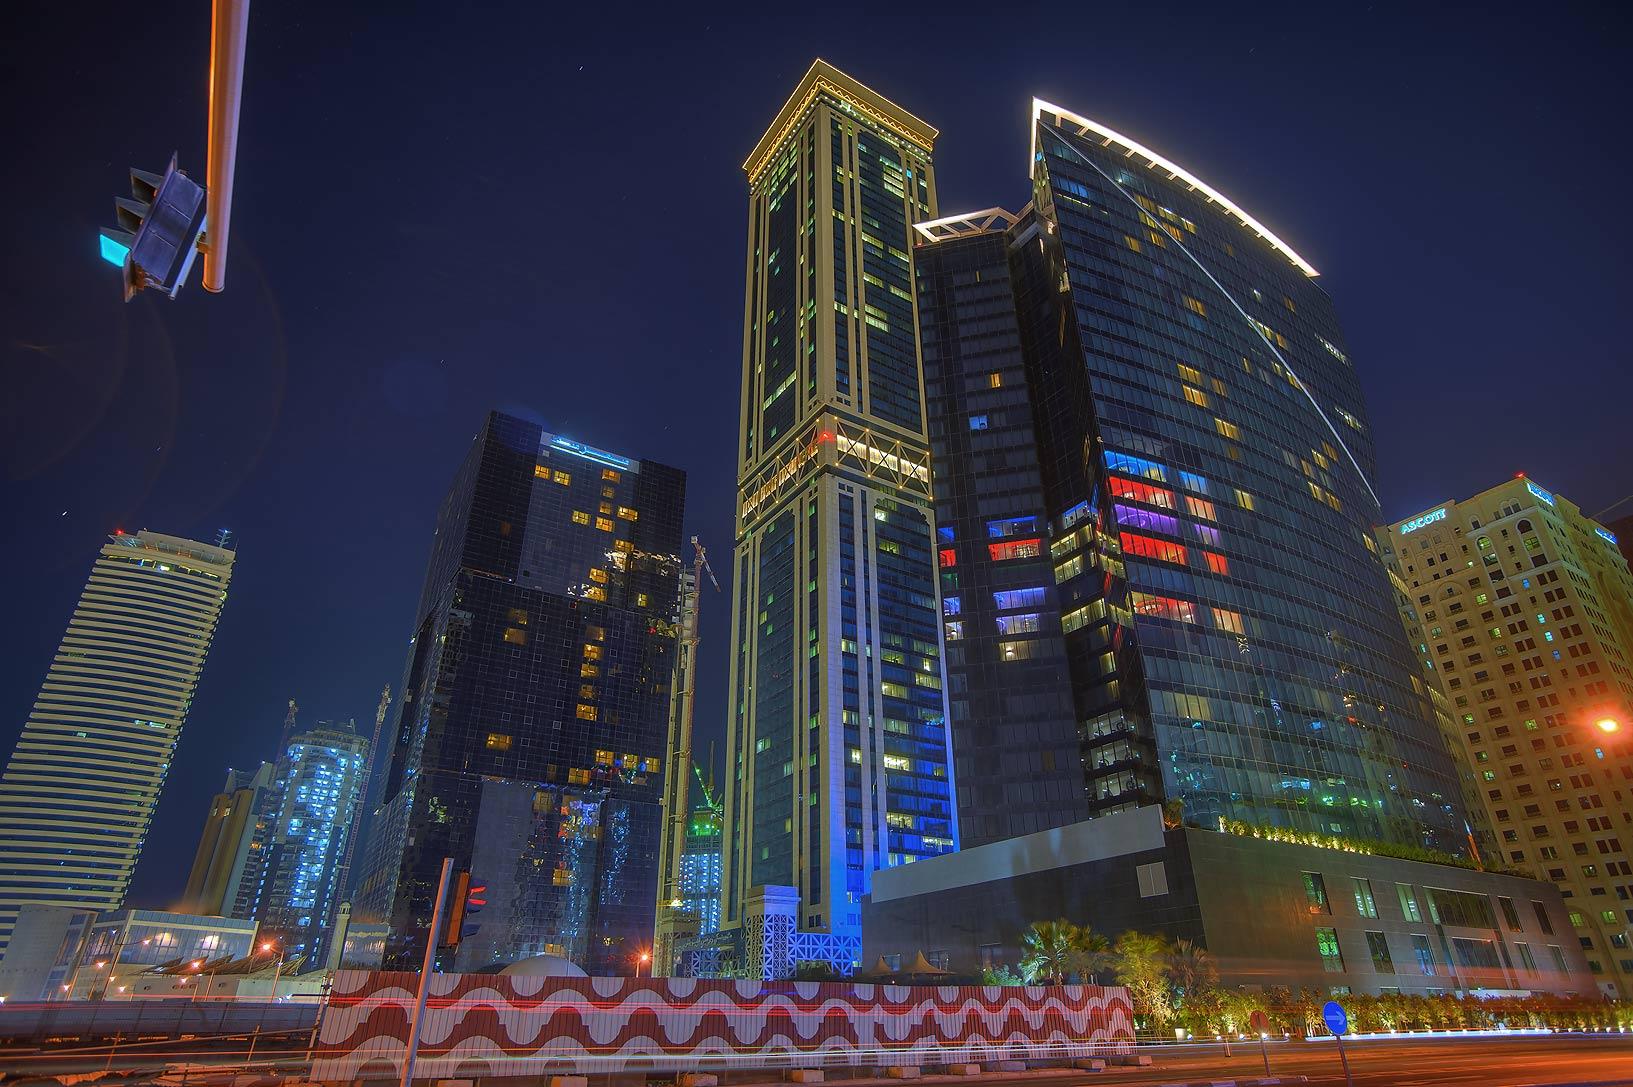 photo 1304 09 somerset kempinski and w hotels in west bay doha qatar rh asergeev com